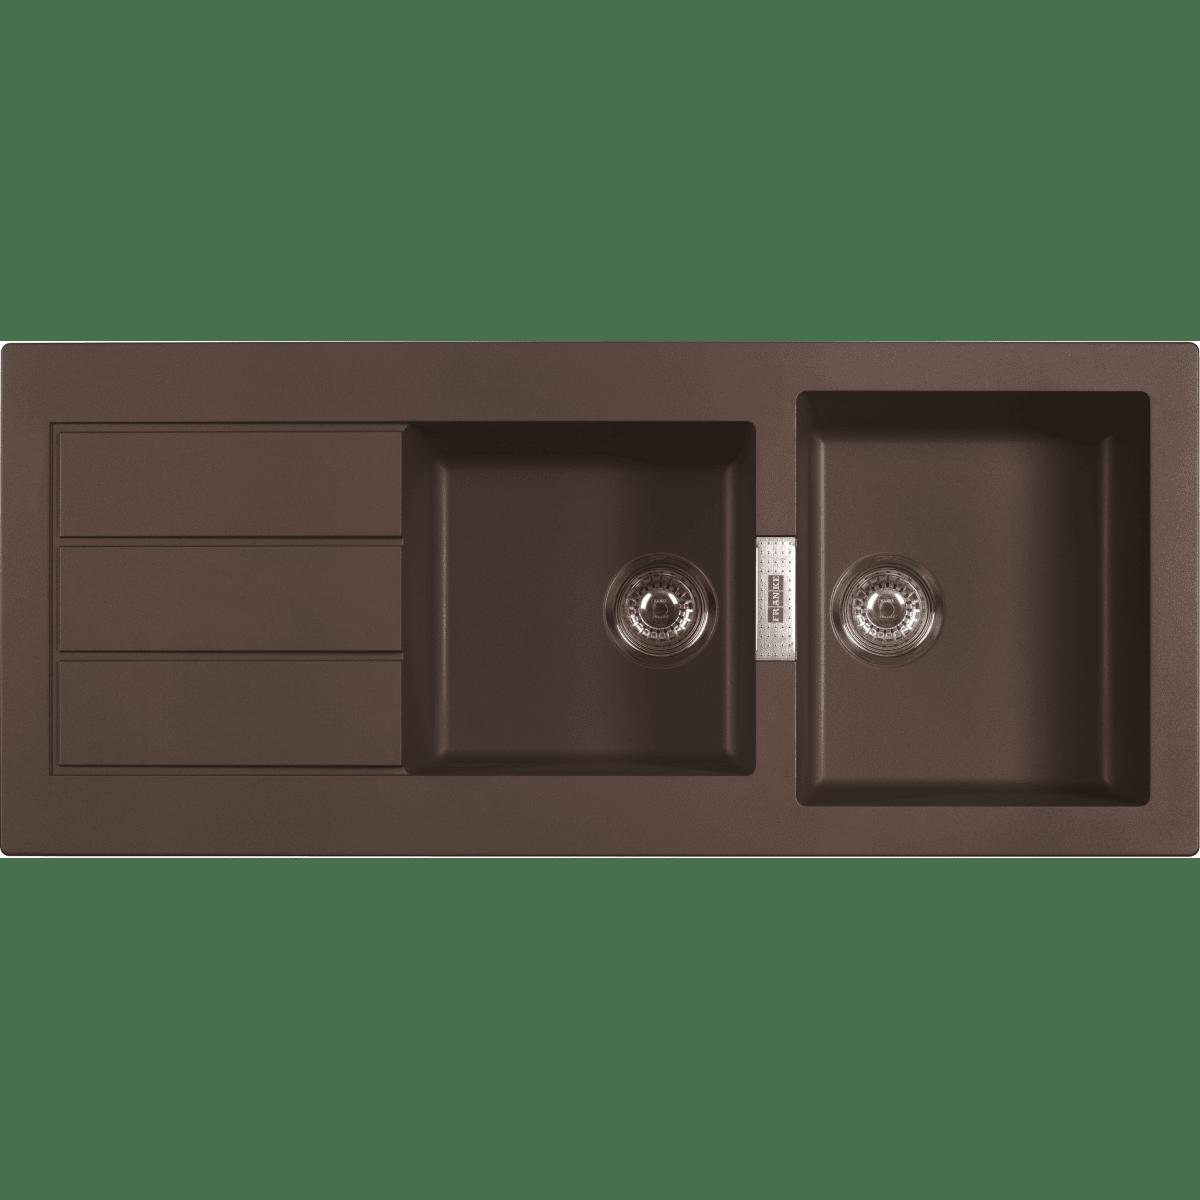 Franke sirius tectonite sid621 chocolat eviers direct evier - Evier franke sirius tectonite ...